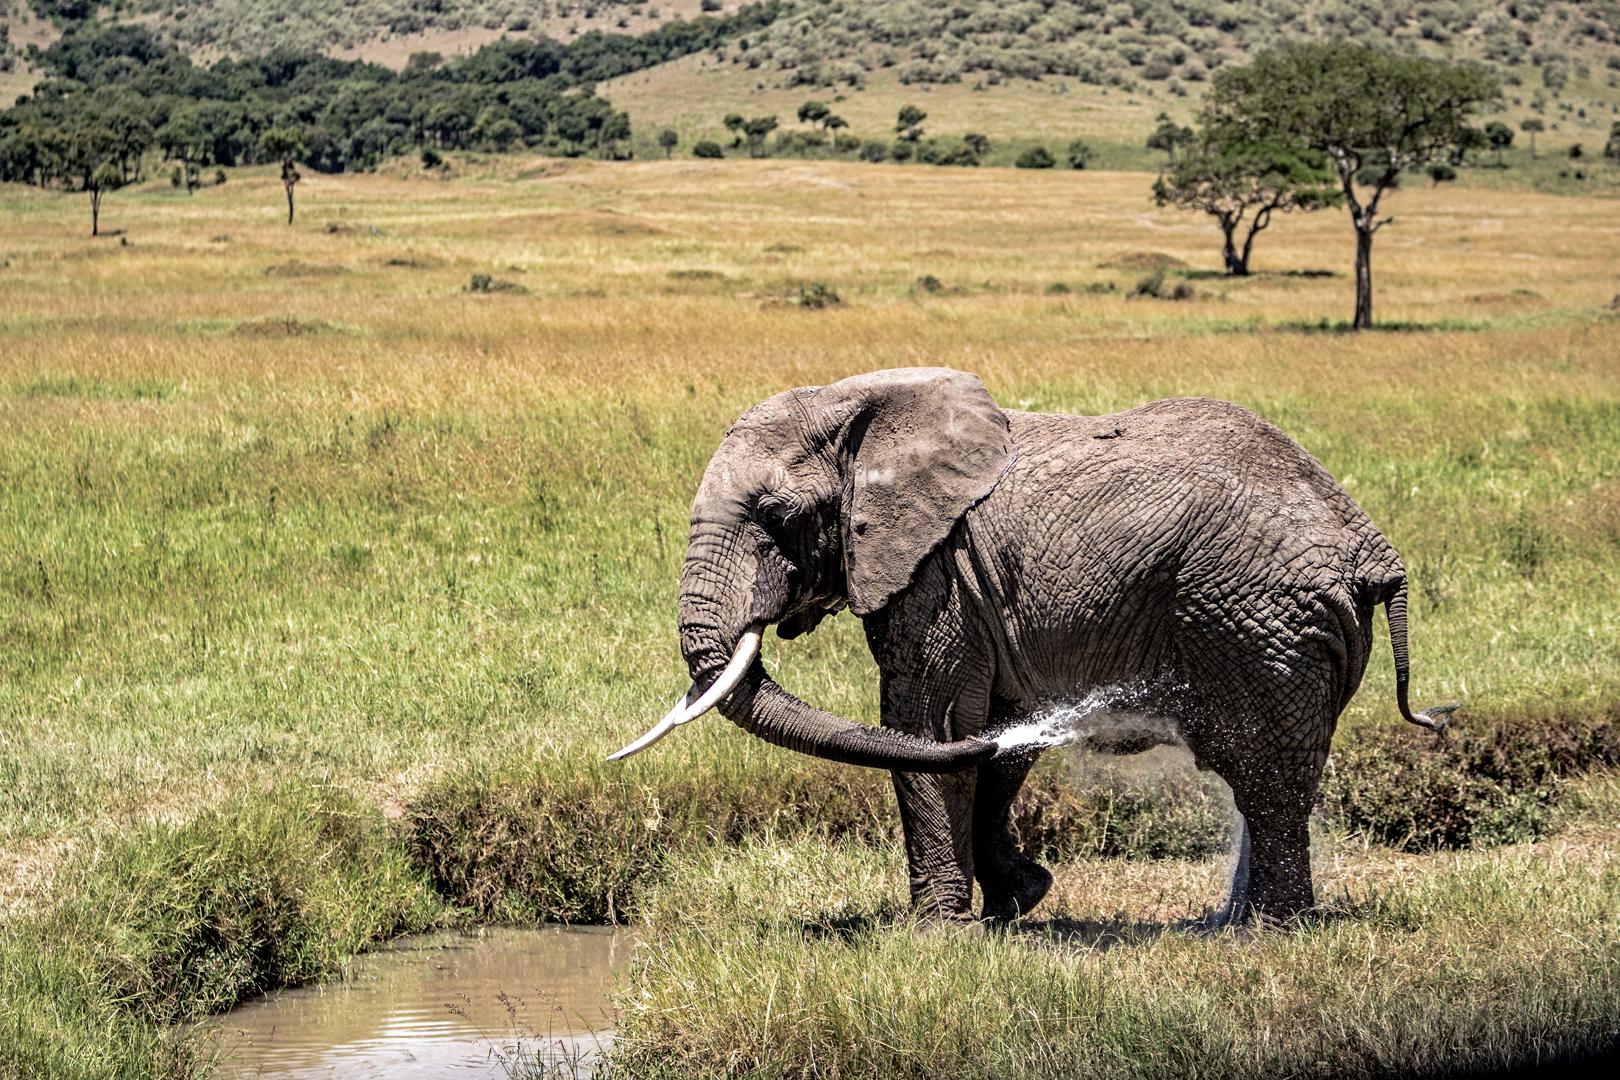 Elephant Spraying Water Bathing in Kenya Africa.jpg